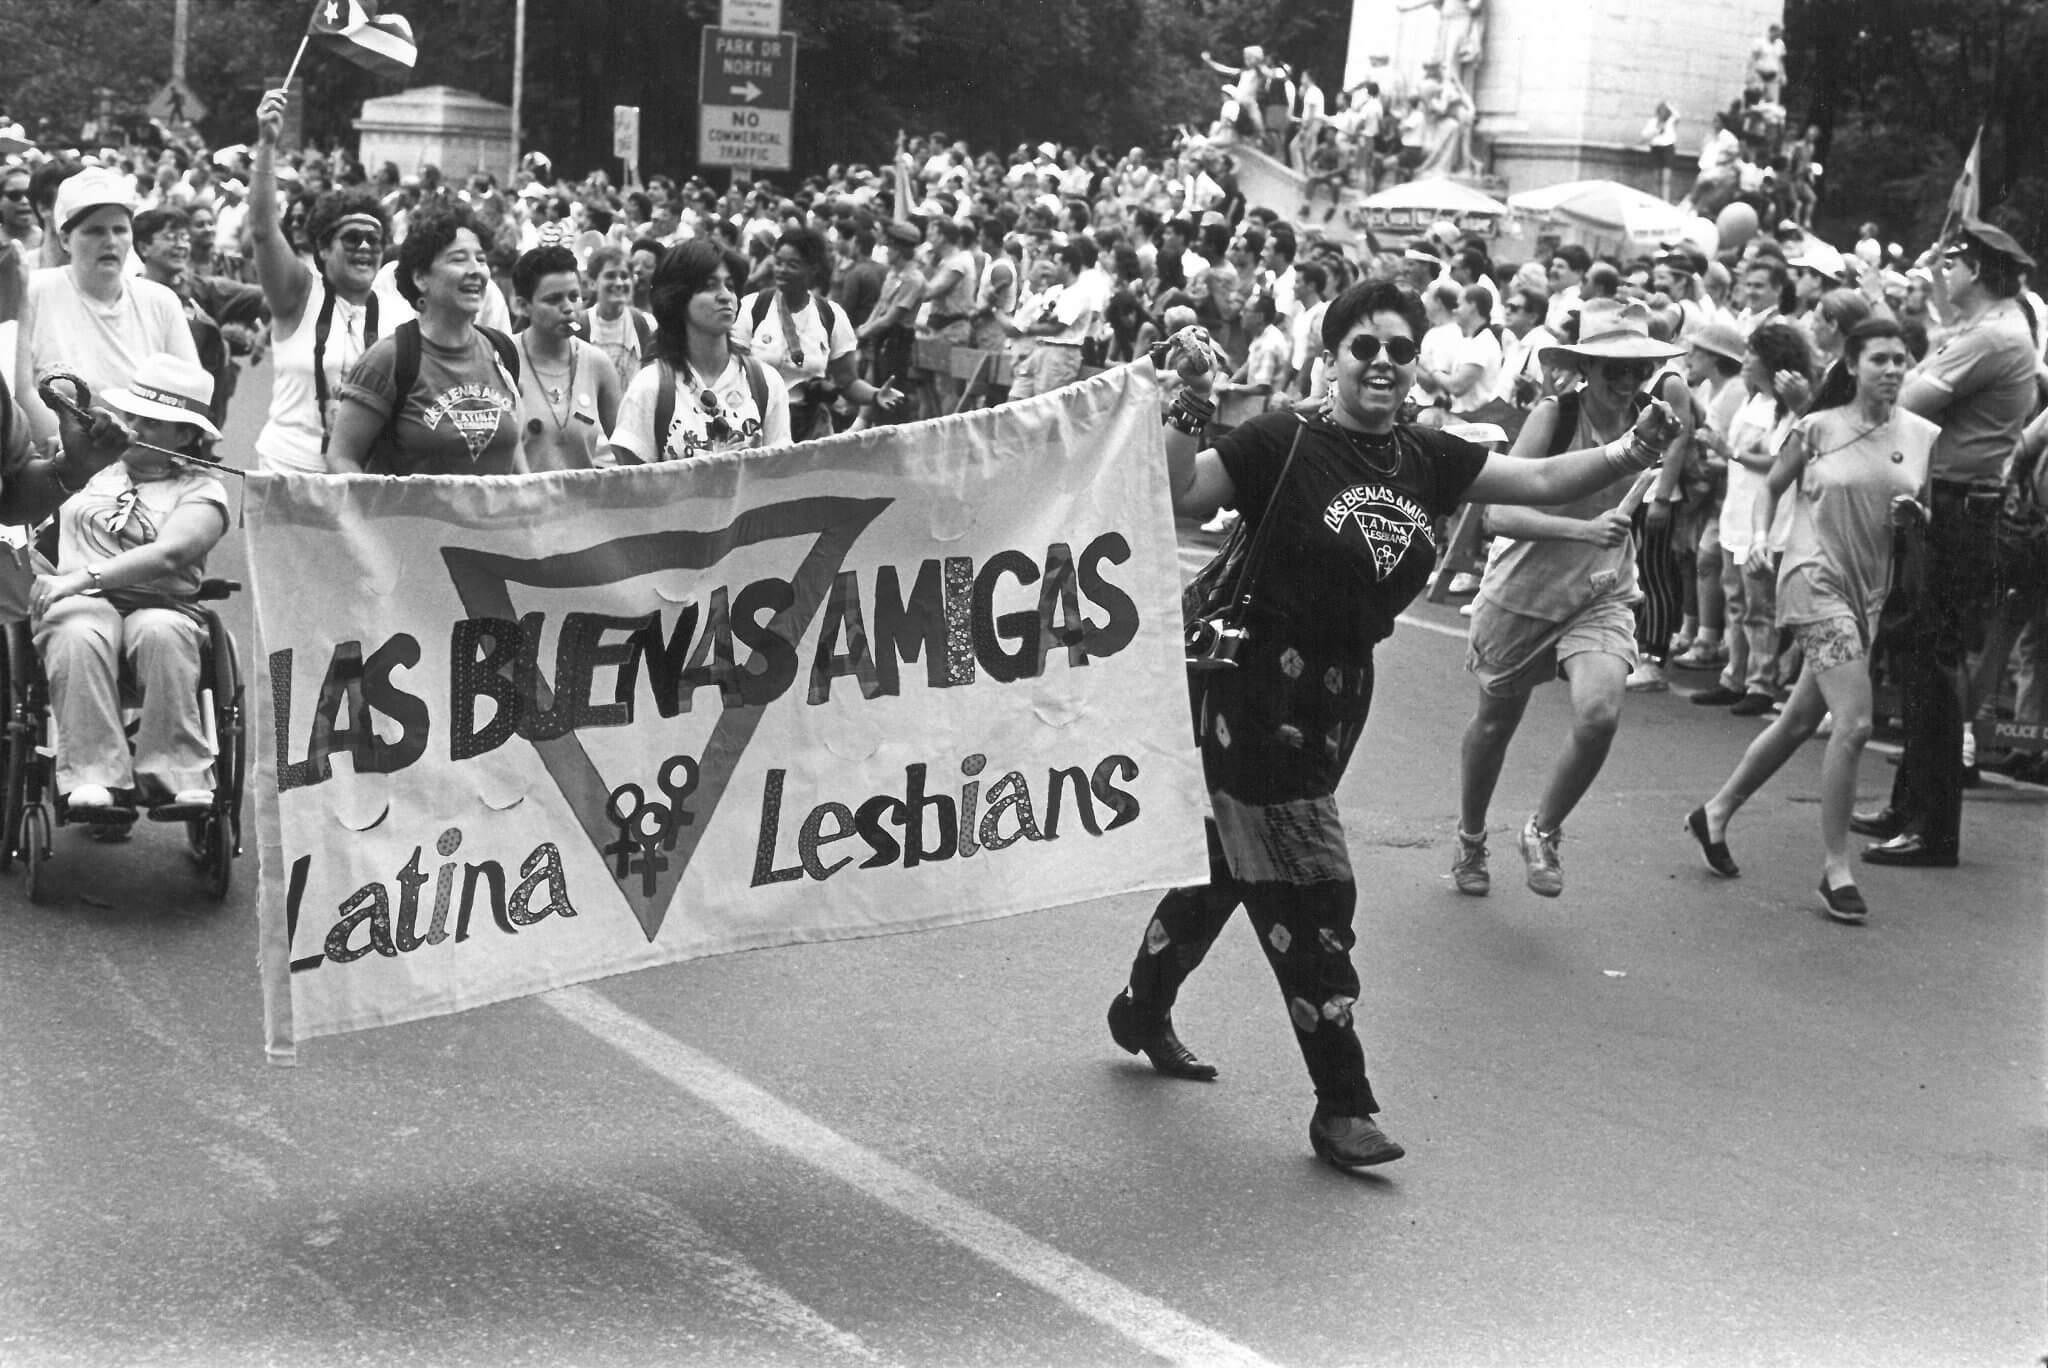 NYC Pride March, June 30, 1991